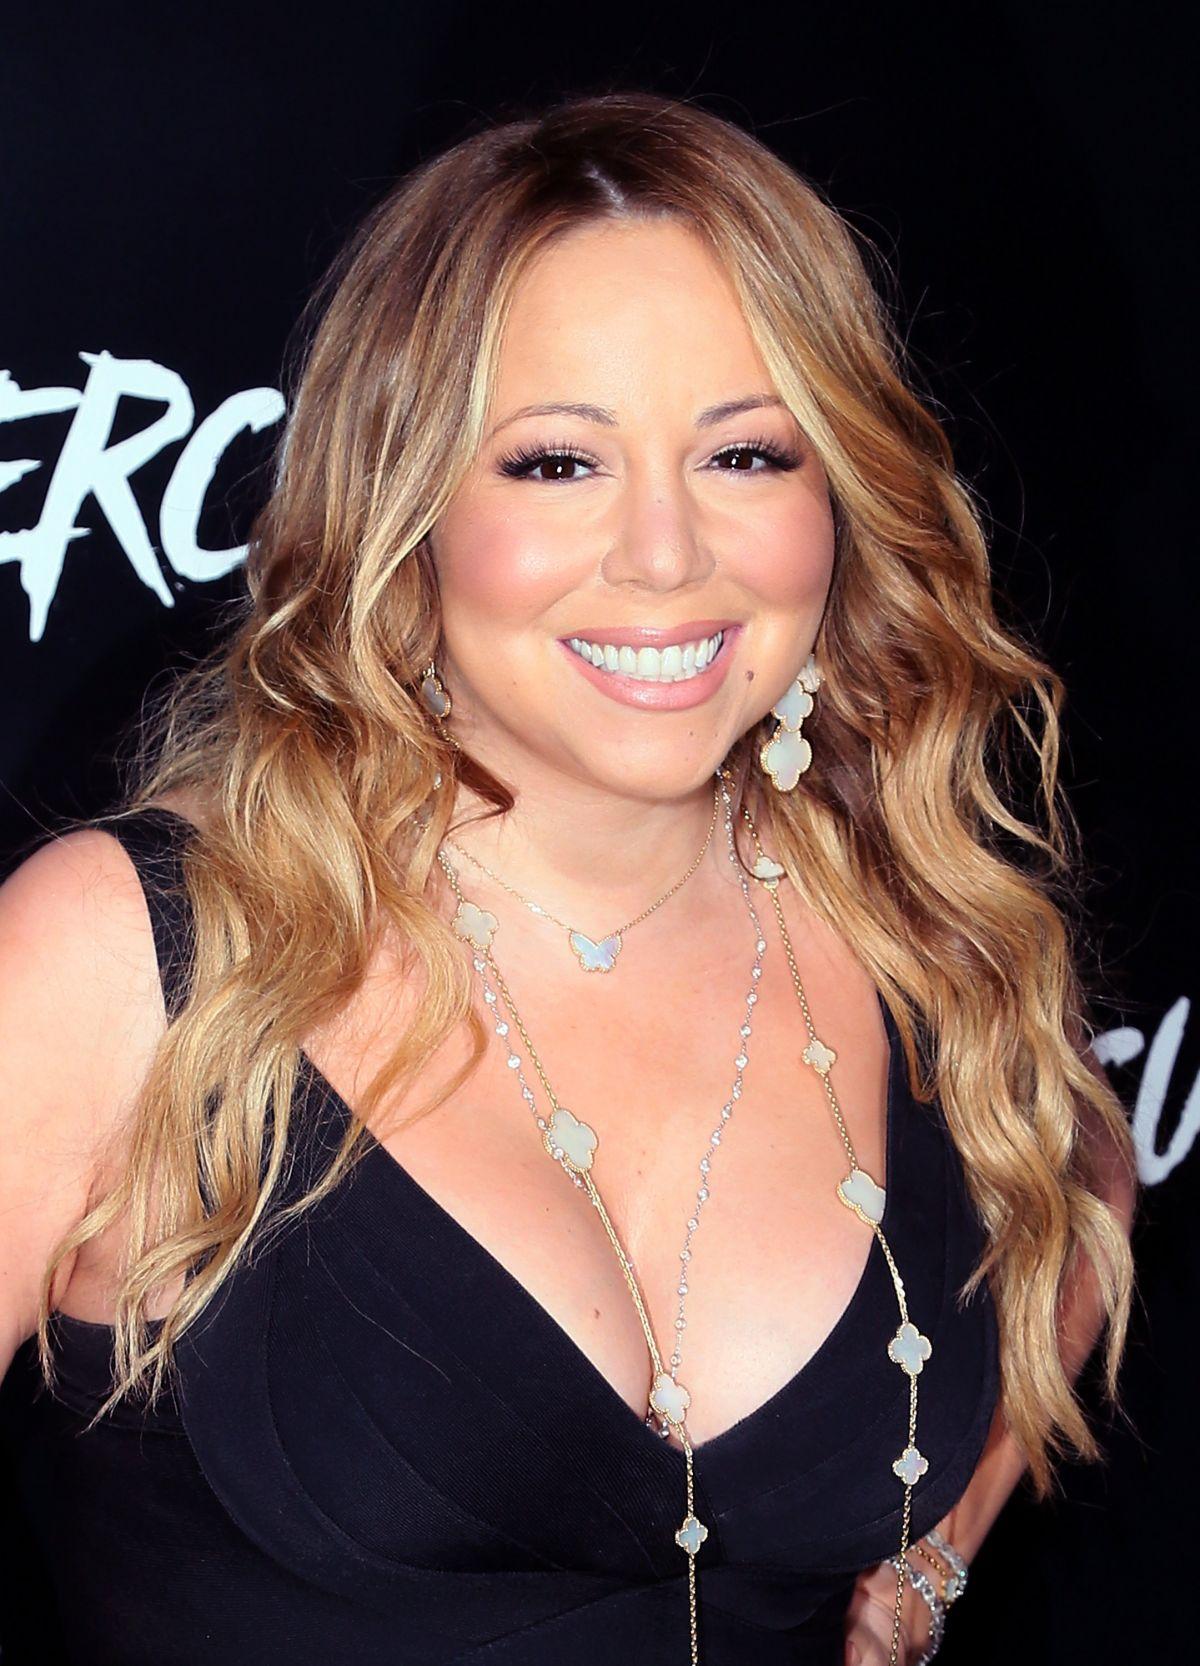 MARIAH CAREY at Hercules Premiere in Los Angeles - HawtCelebs ... Mariah Carey